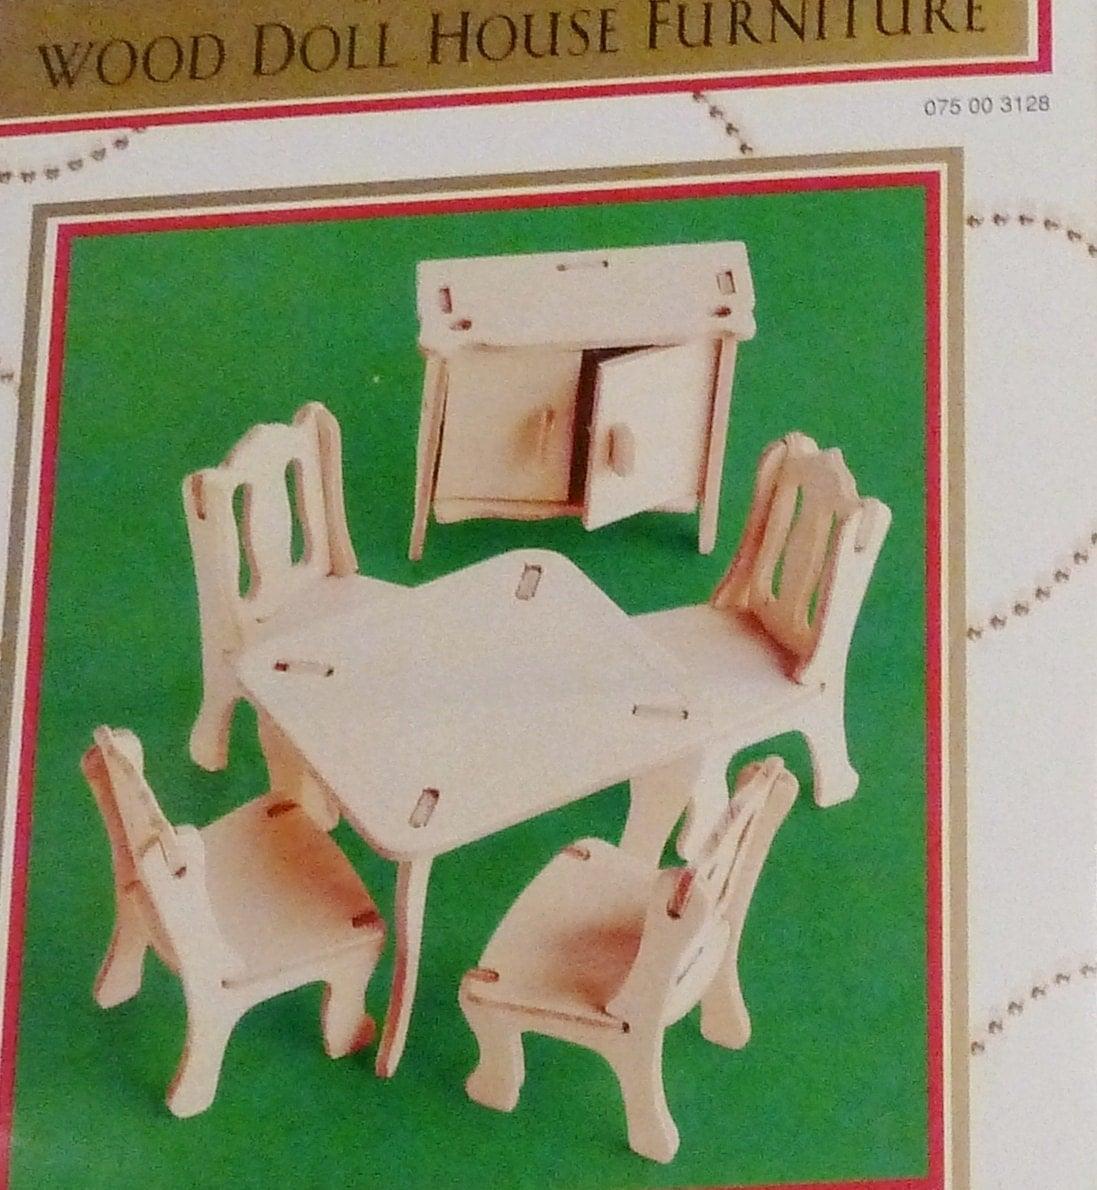 Dollhouse Furniture Kit Miniature Wood Furniture No Tools